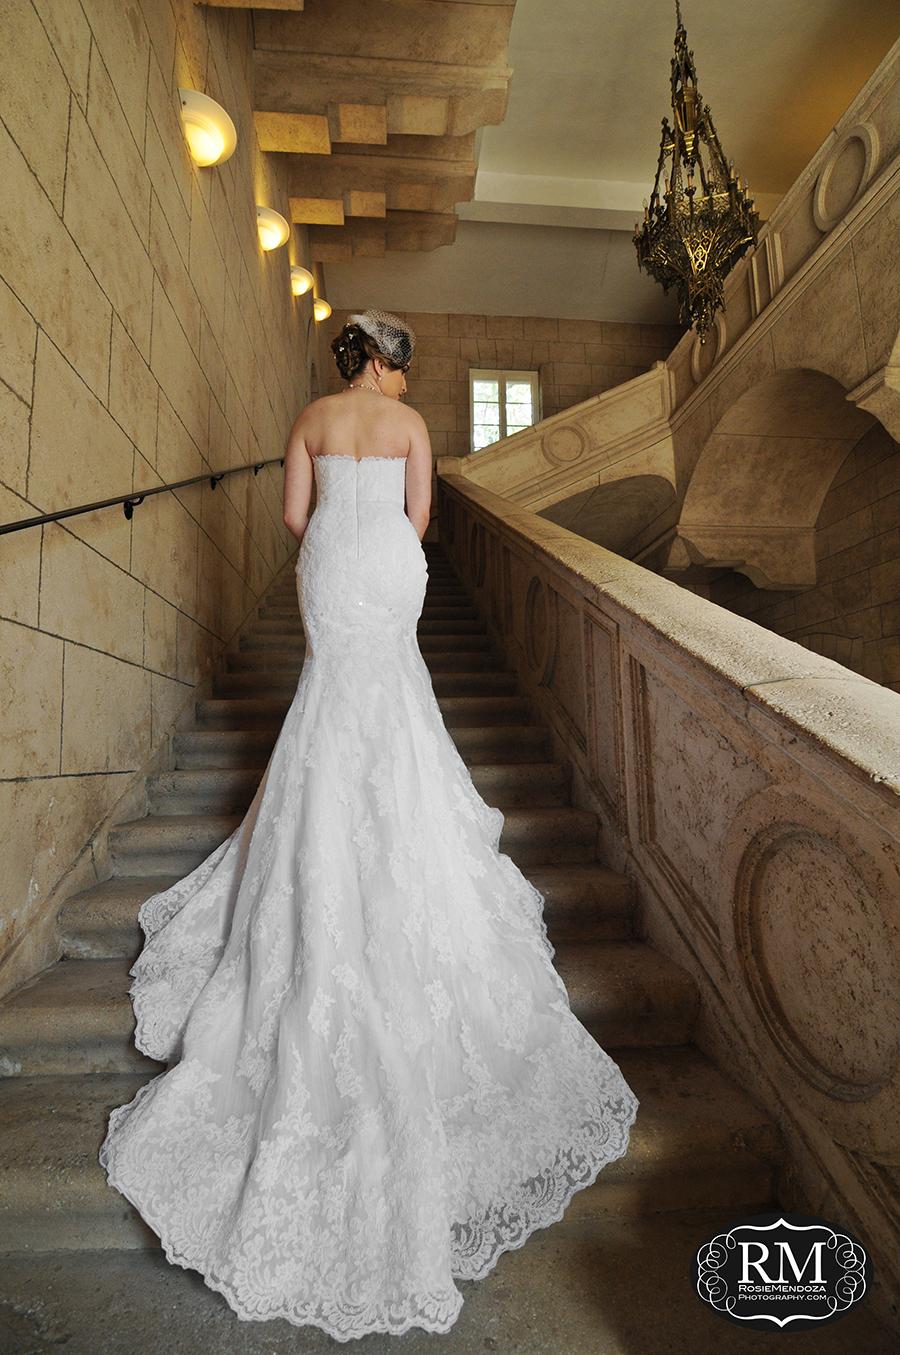 Bride showing off her beautiful wedding dress